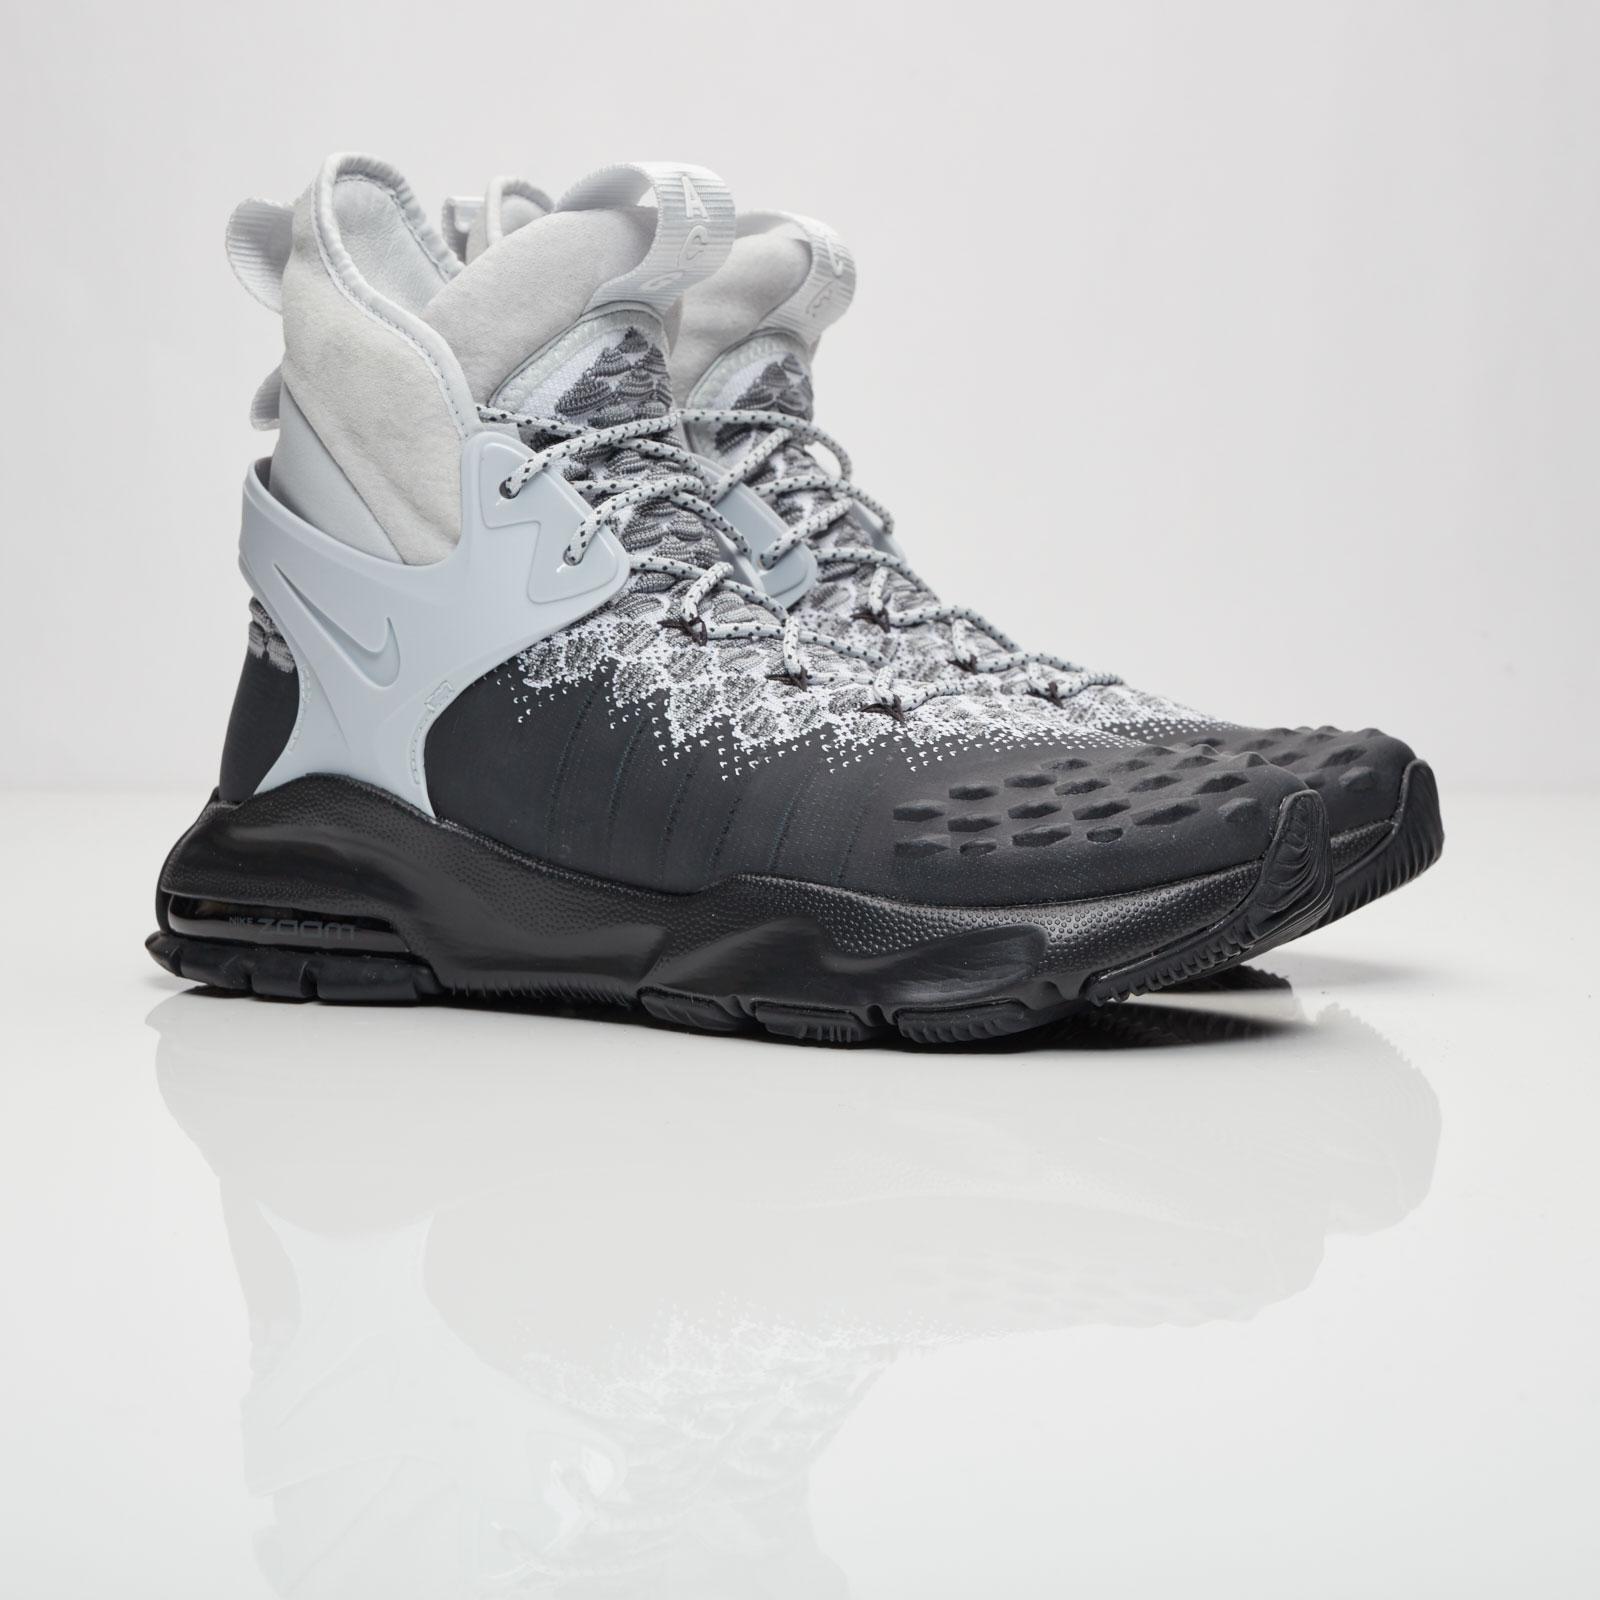 f462376abe3f Nike Zoom Tallac Flyknit - 865947-003 - Sneakersnstuff